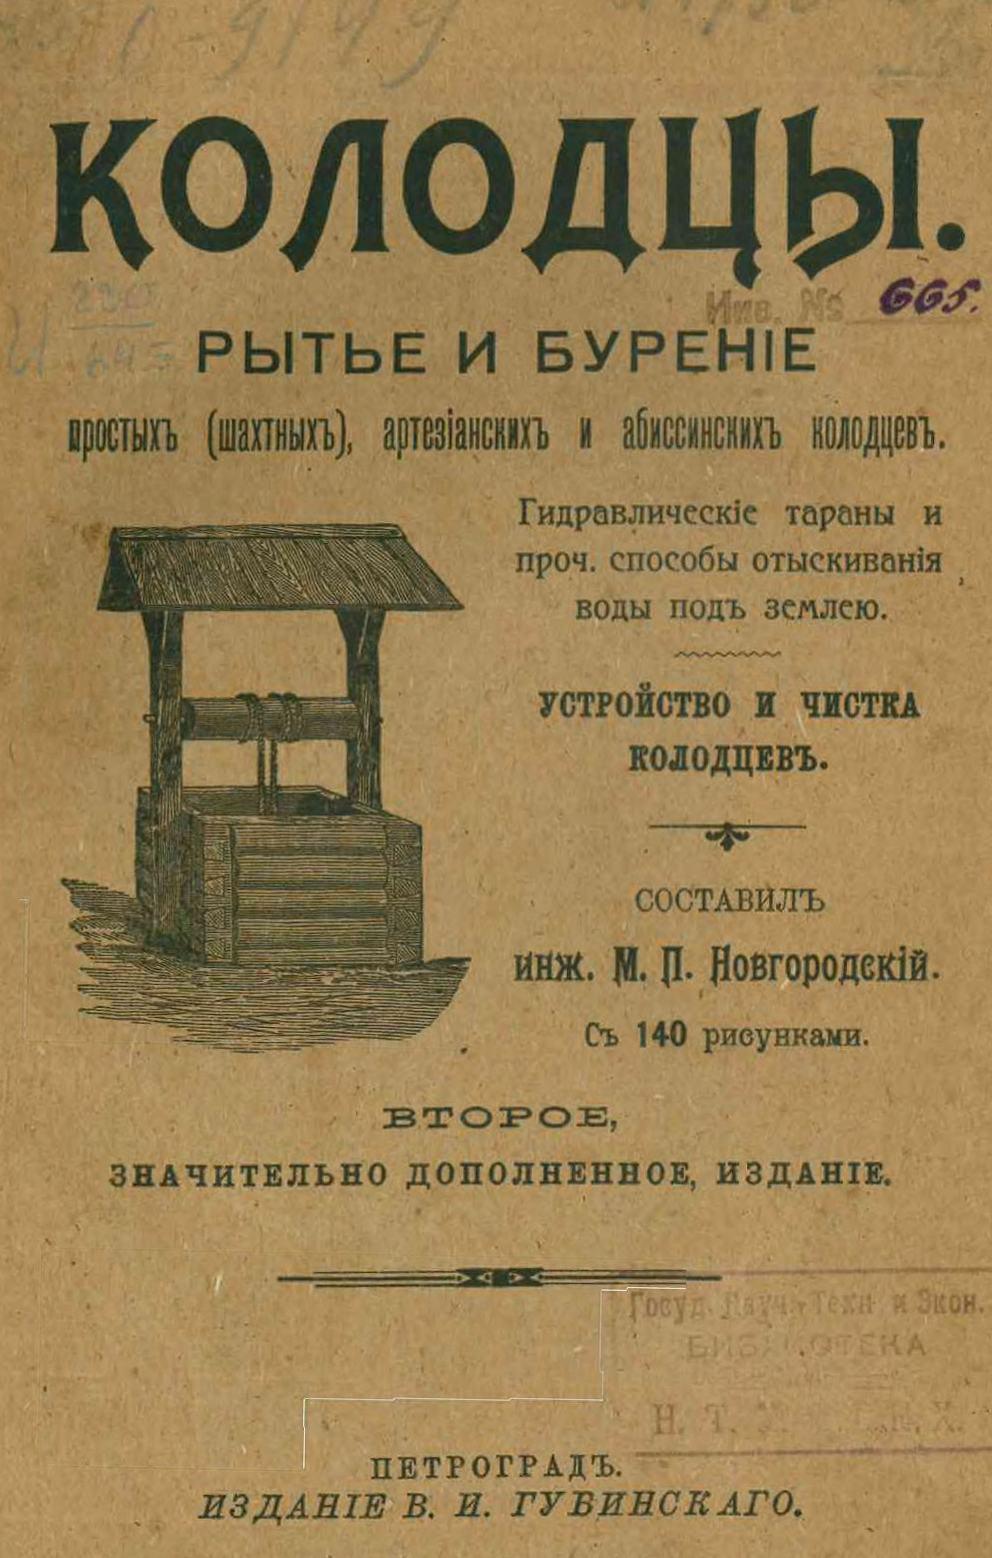 novgorodskii-kolodtcy-ryte-i-burenie-1916-alt_Page1.jpg